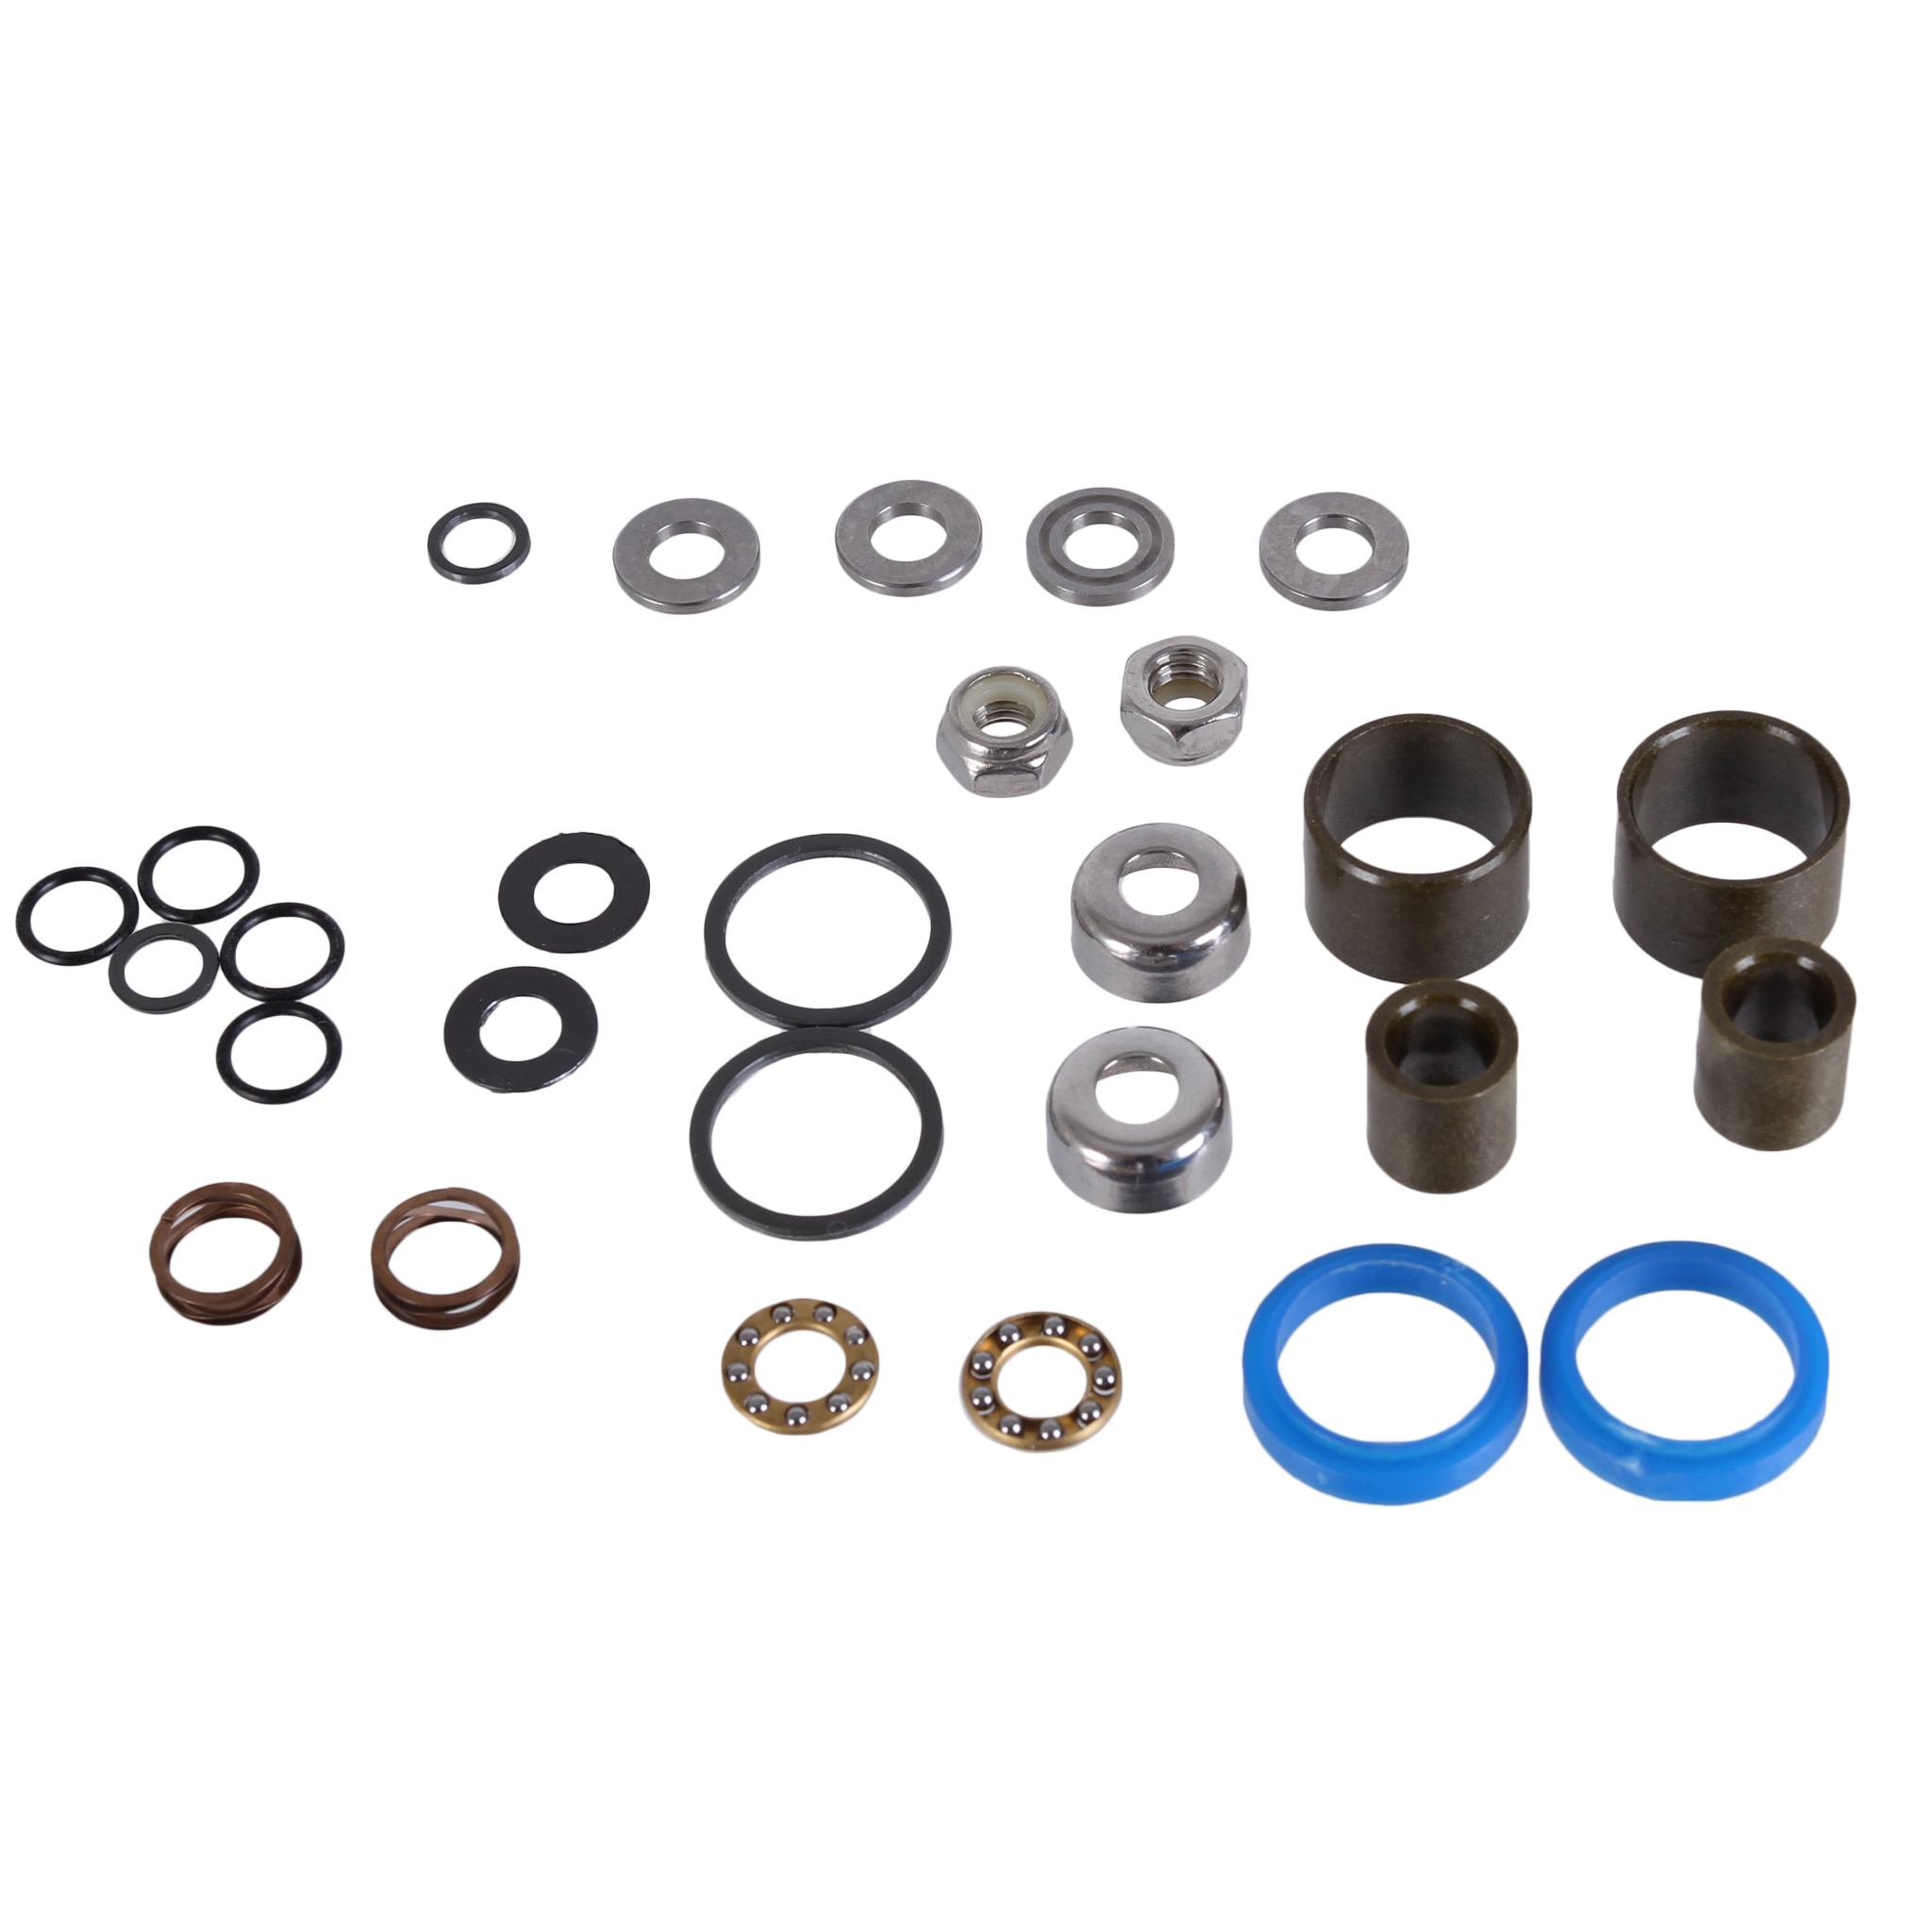 HT Components Pedal Rebuild kit Evo-1